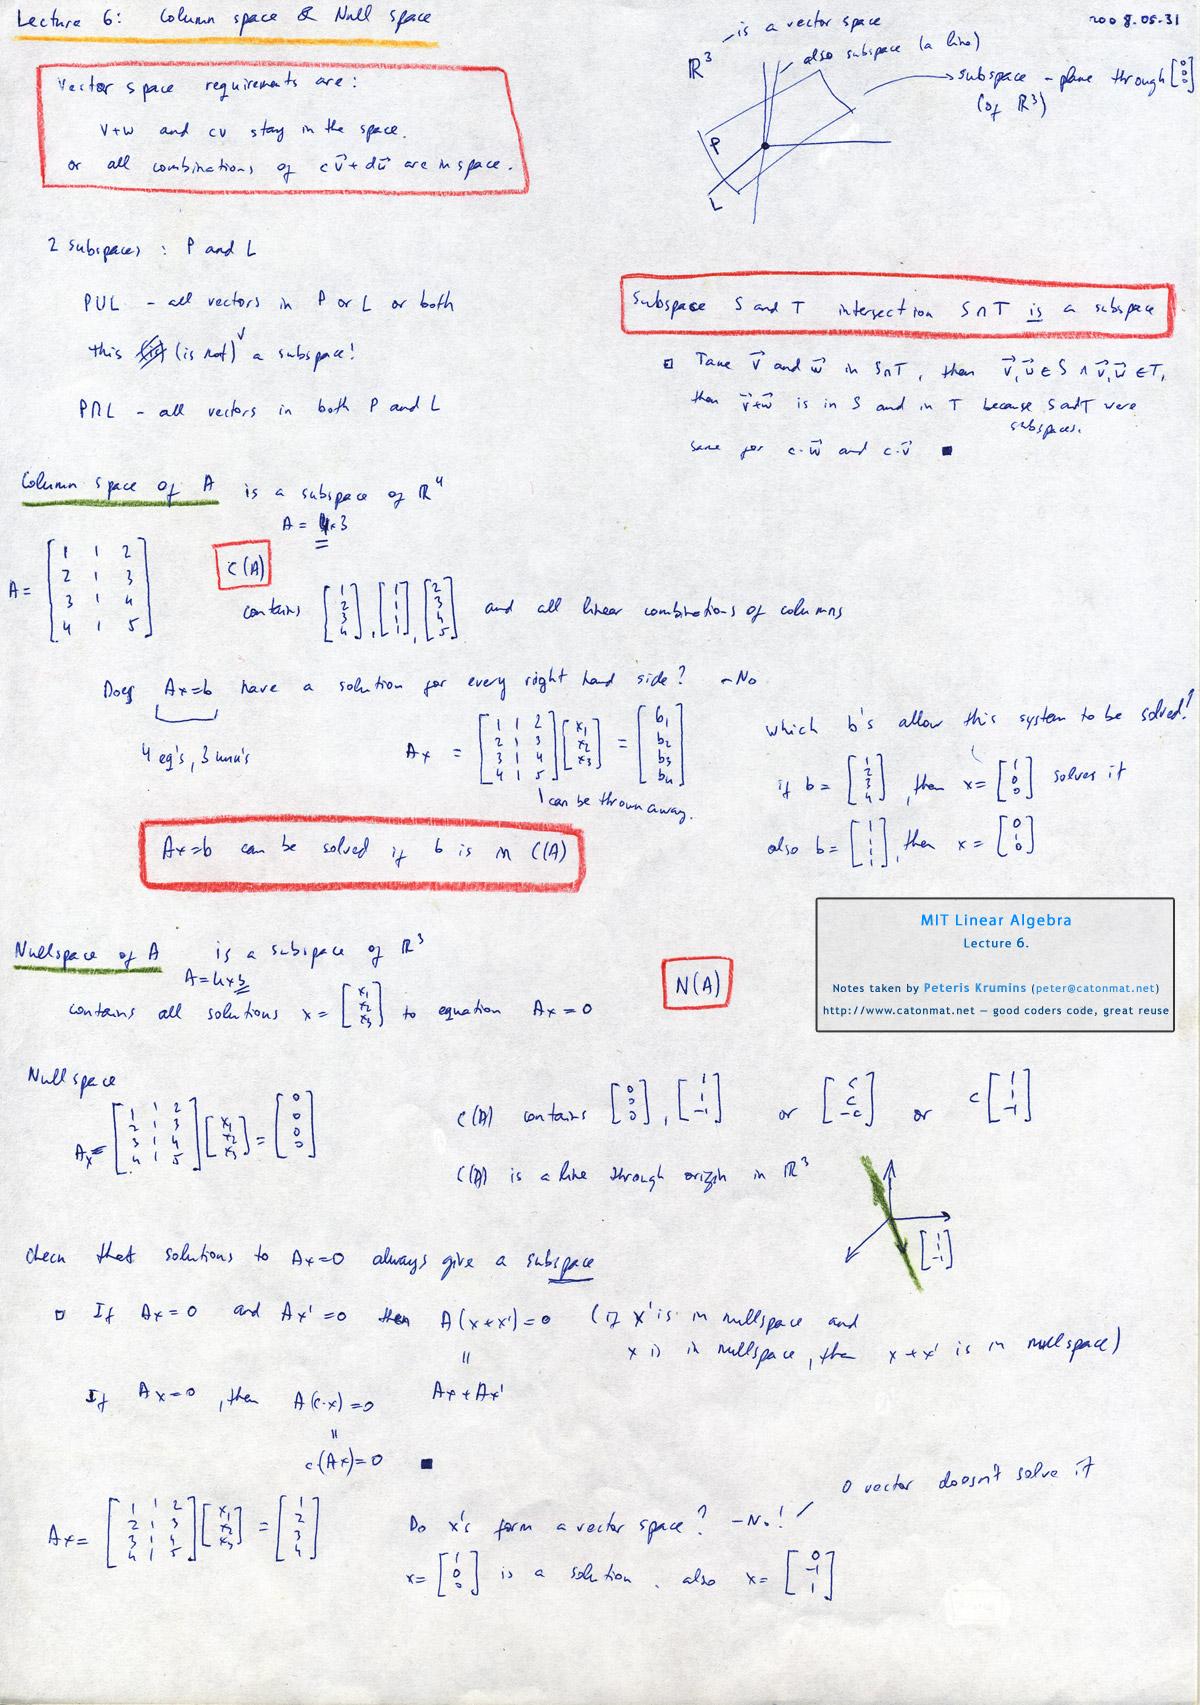 Opinions on Linear algebra